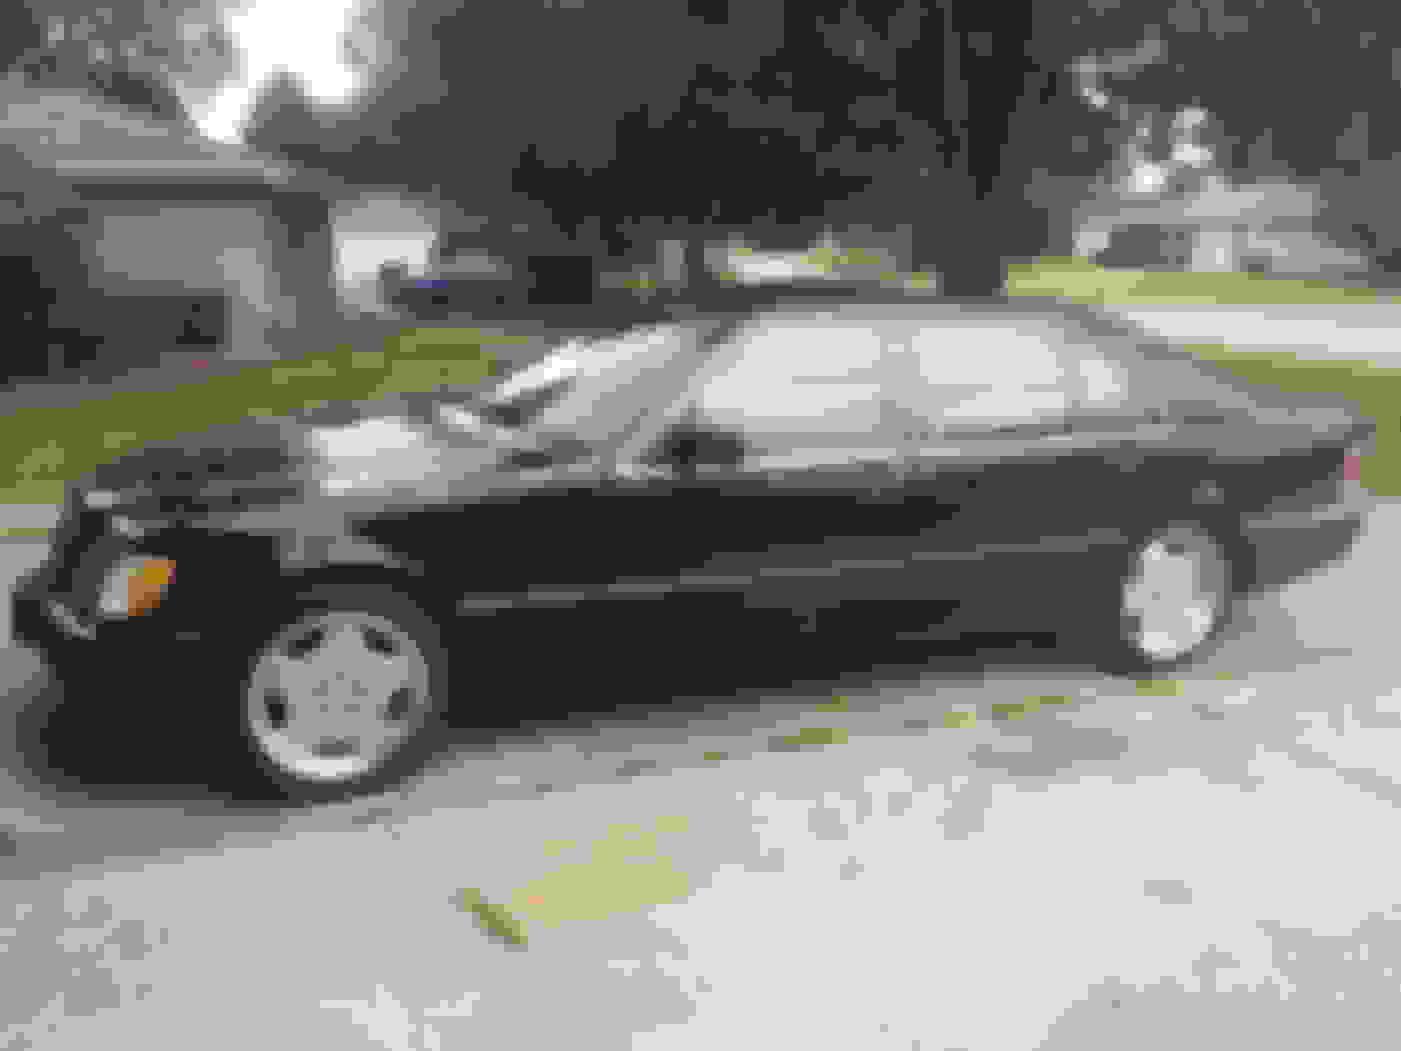 1995 Mercede S420 Fuse Box Location - Wiring Diagram Schema